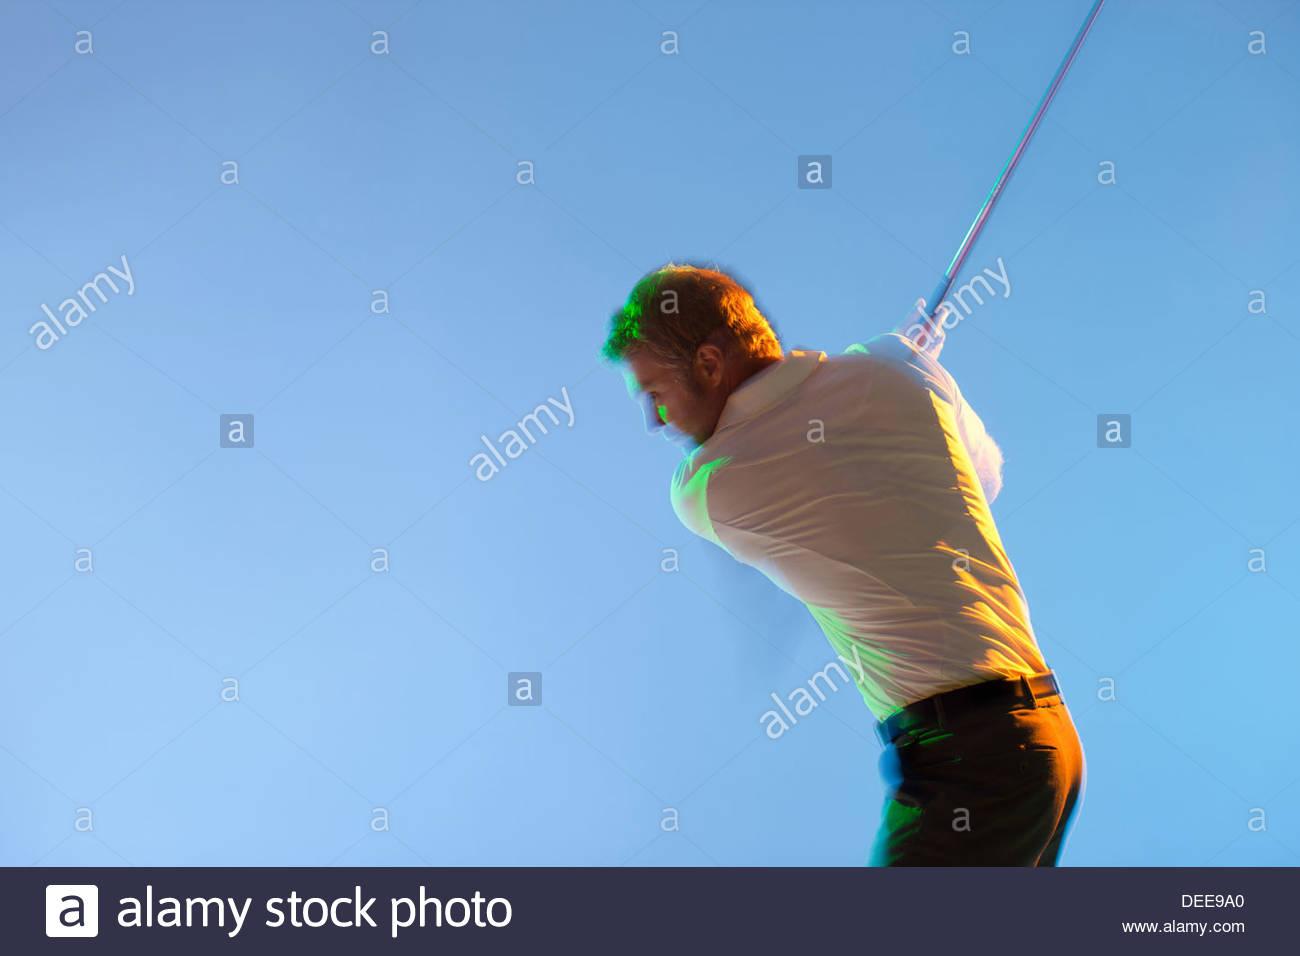 Golf Club Photo Stock